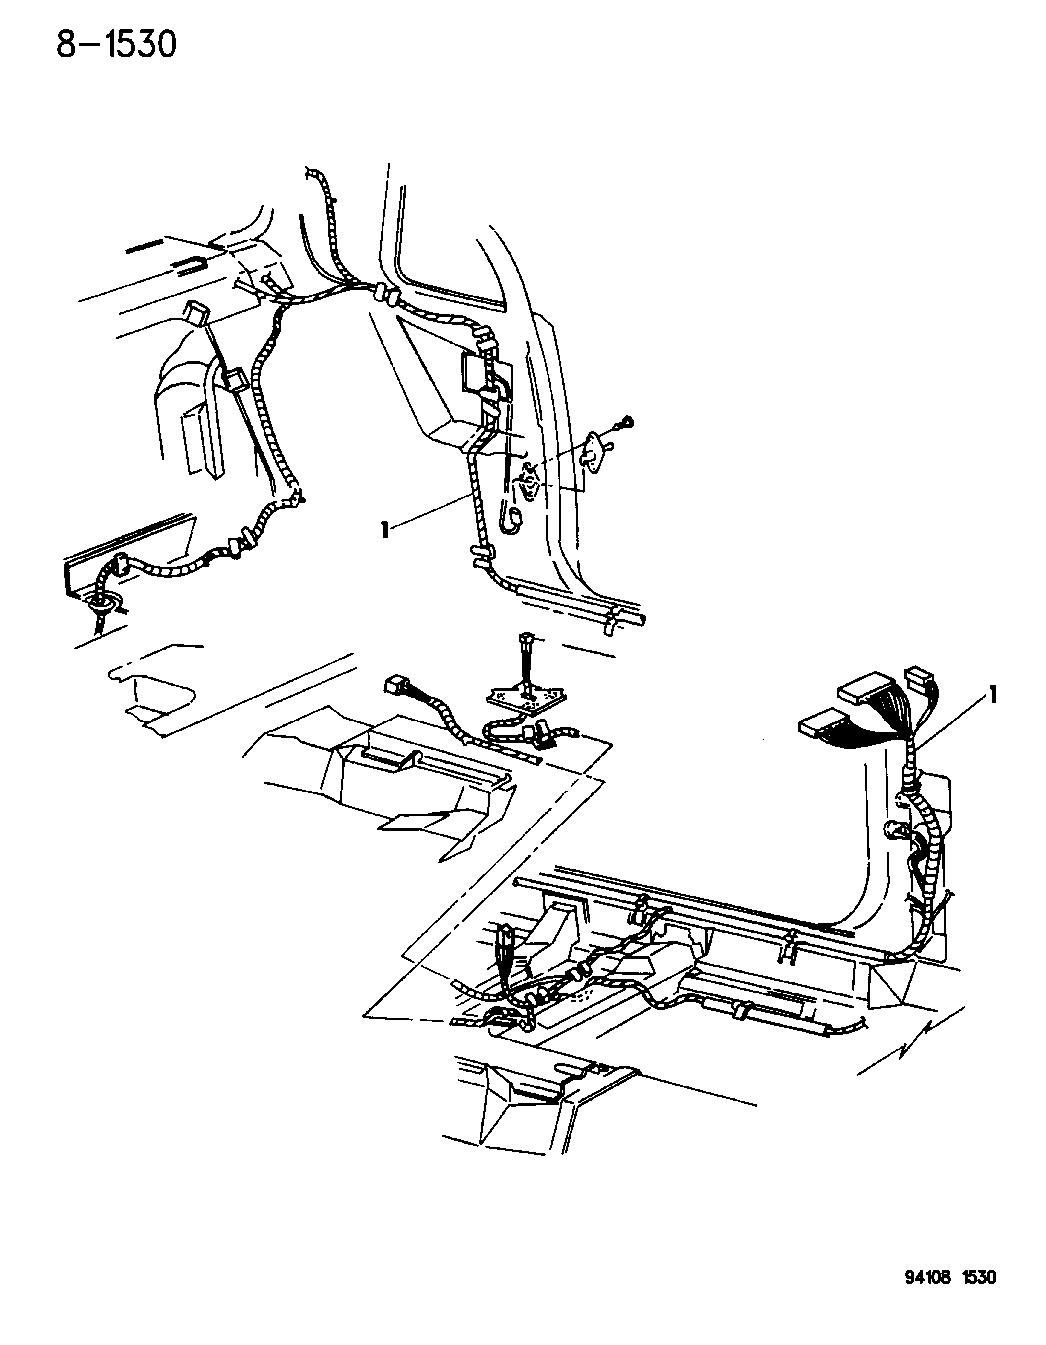 4625761 Genuine Mopar Wiring Front End Lighting 94 Chrysler Lebaron Diagram 1994 Gtc Body Accessories